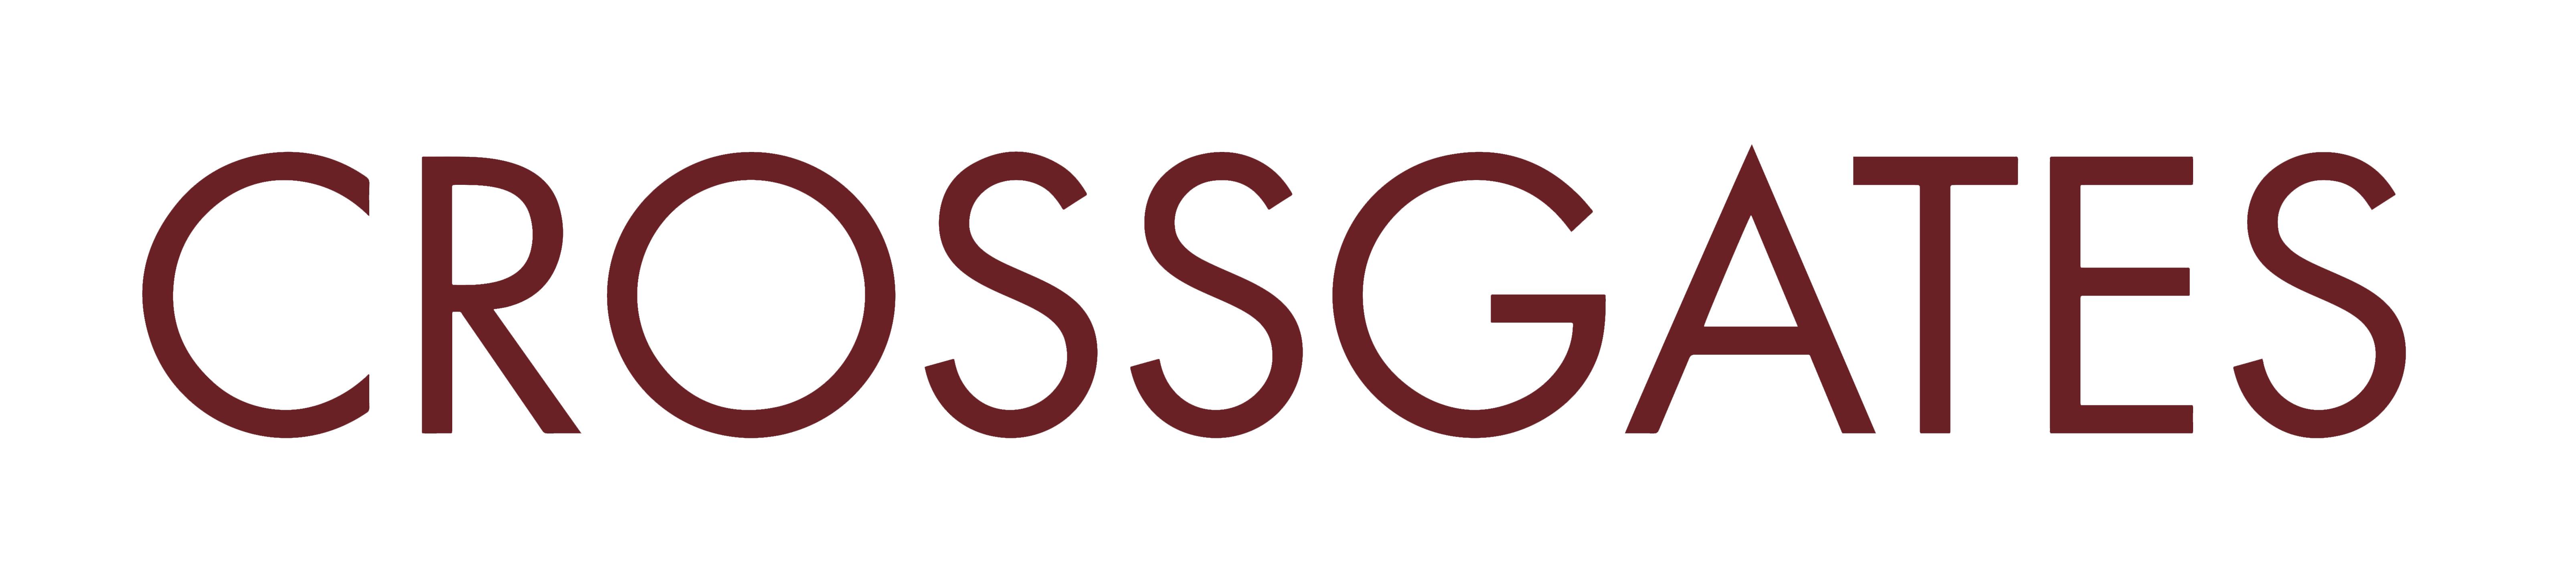 Image result for crossgates logo